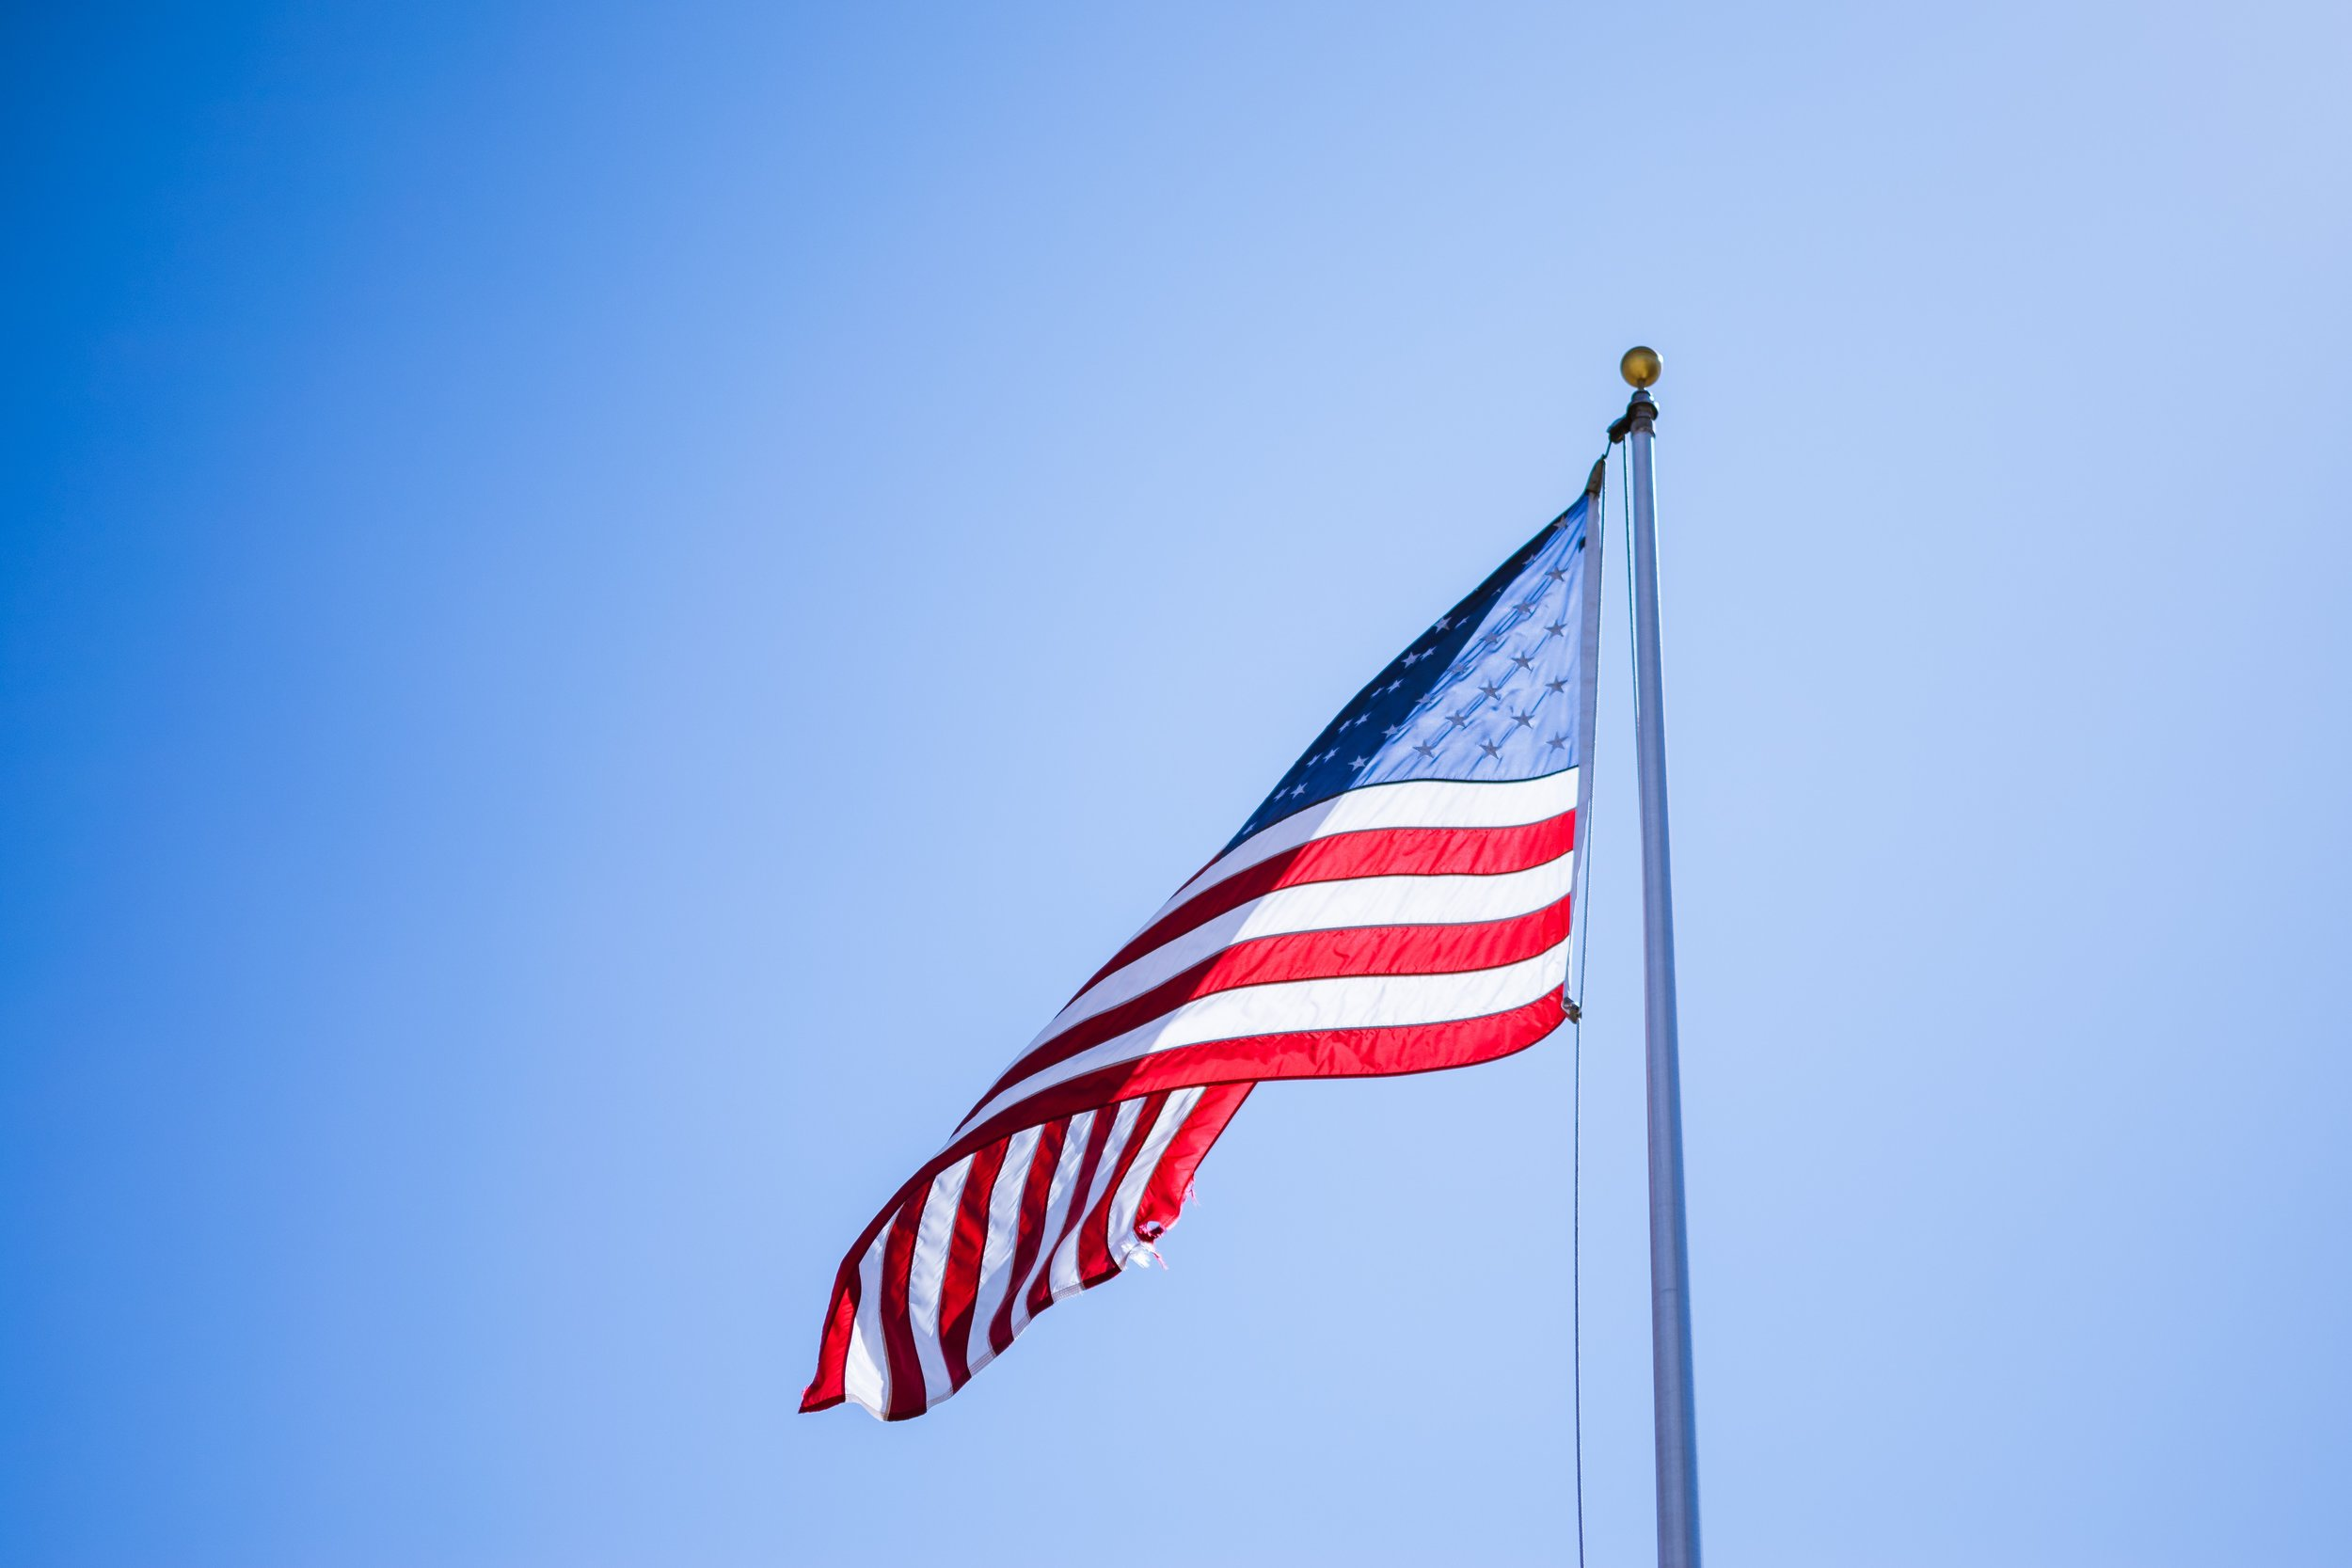 america-american-flag-blue-sky-951382.jpg